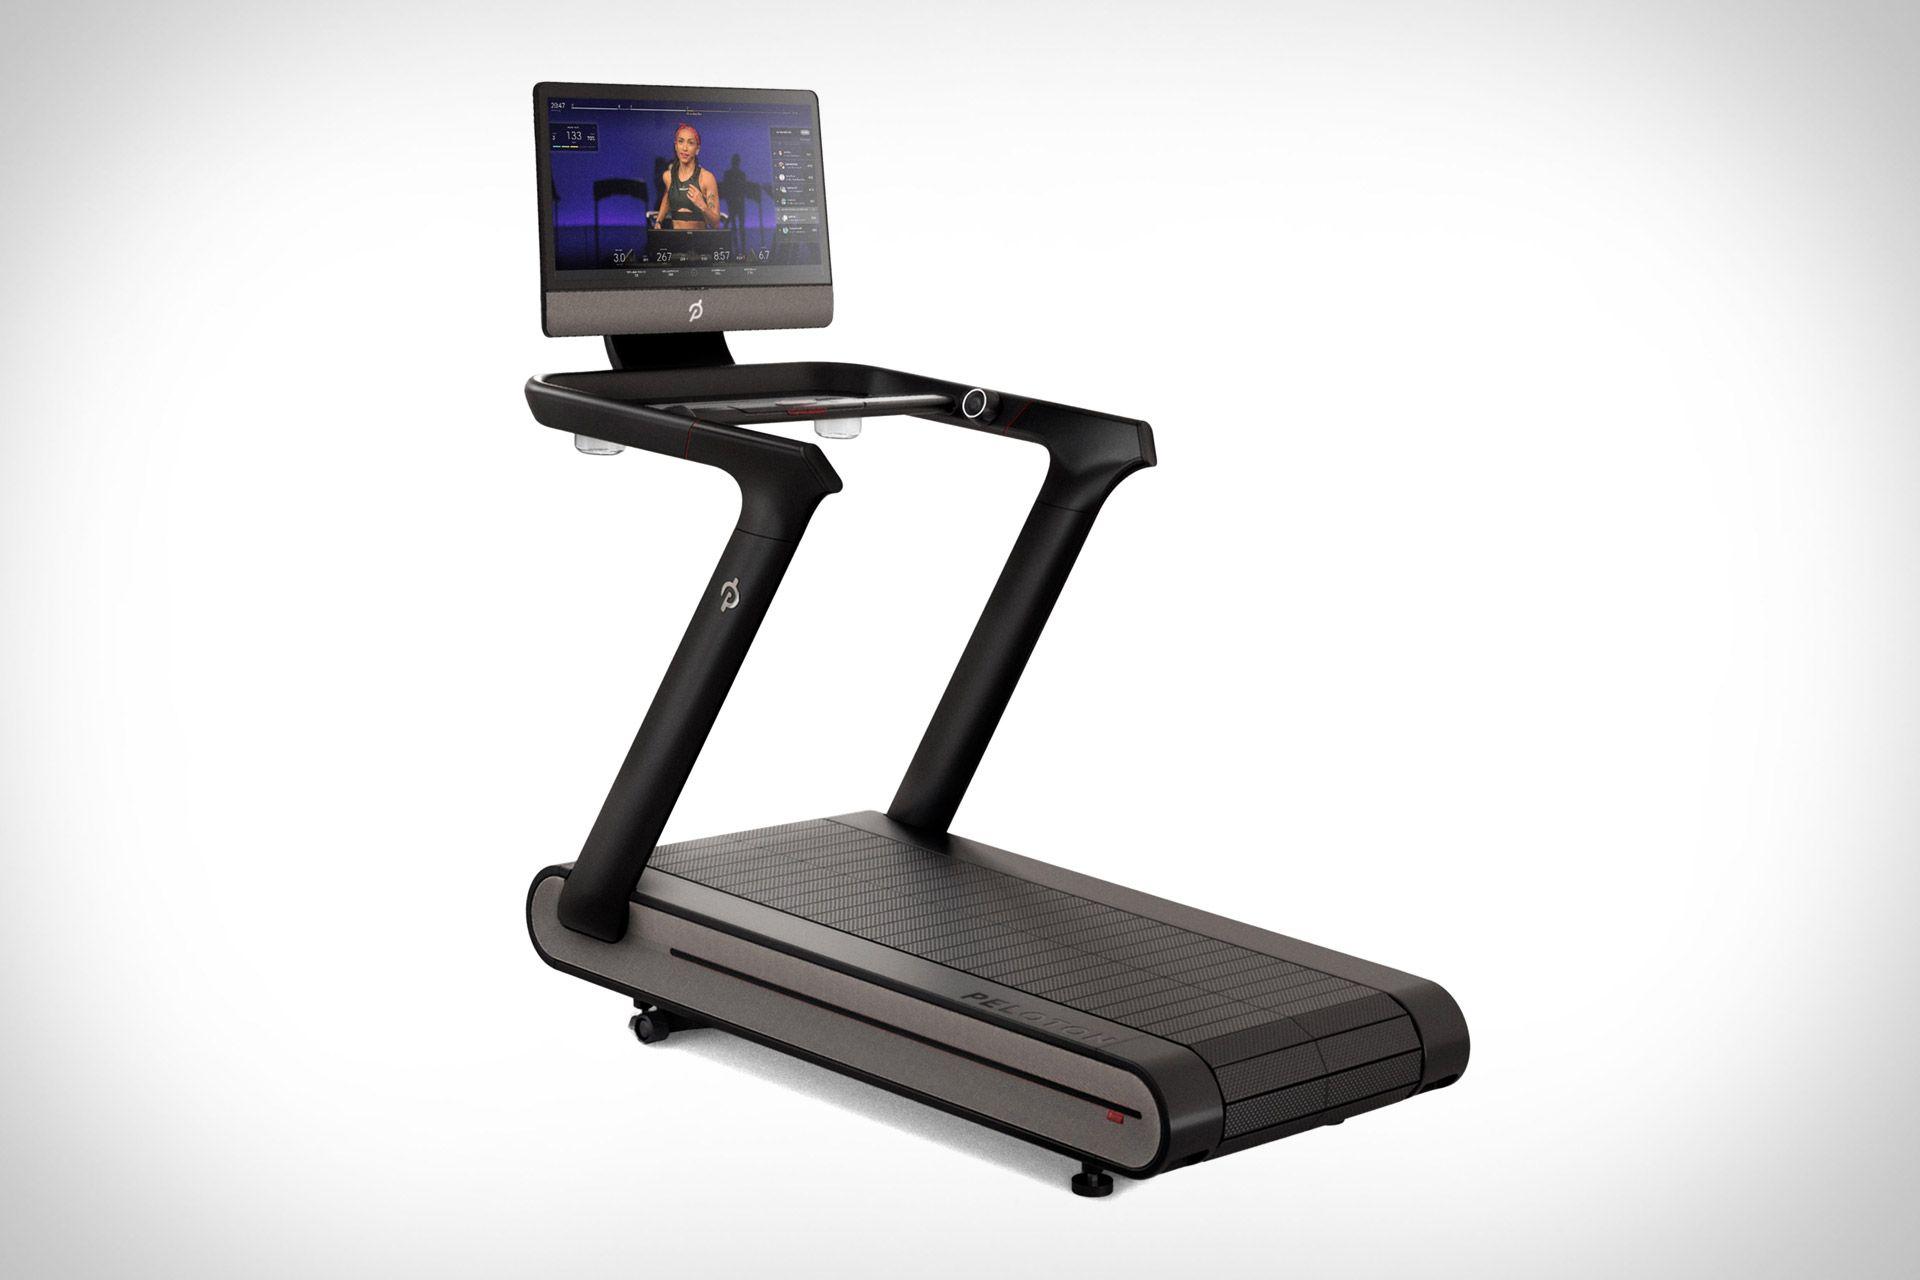 Can You Watch Tv On Peloton Peloton Tread Interactive Treadmill Treadmill Peloton Fitness Tech